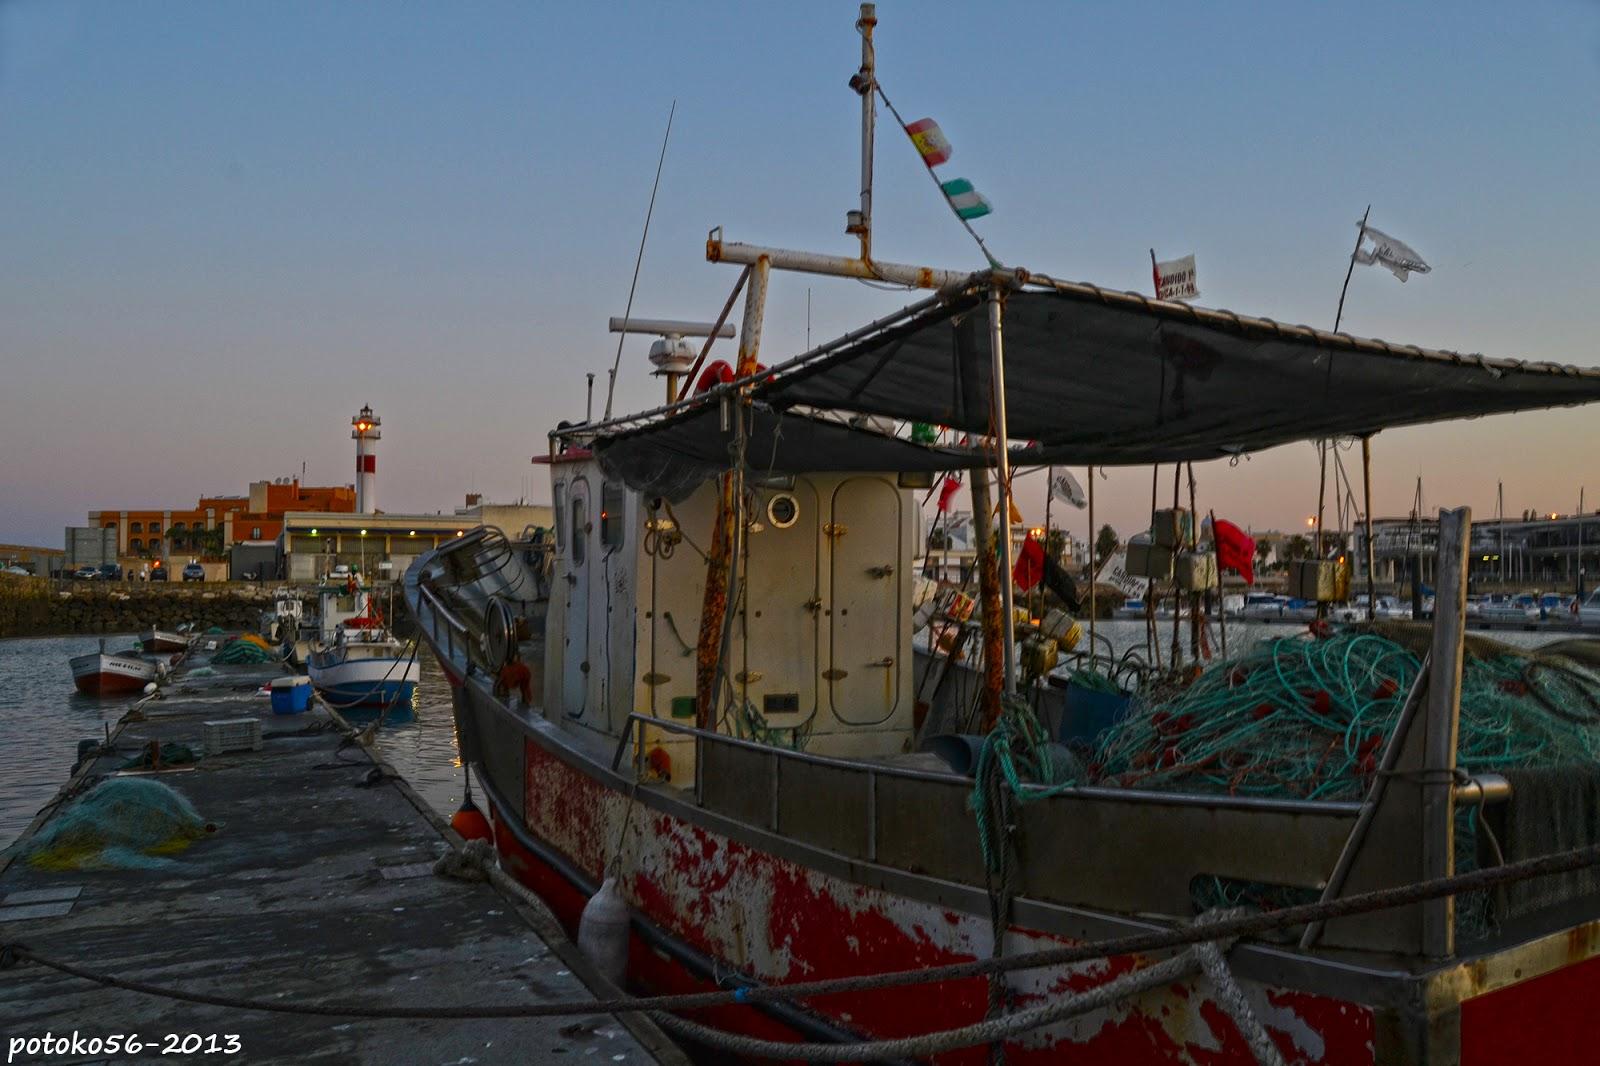 Rota marinera con sus barcos